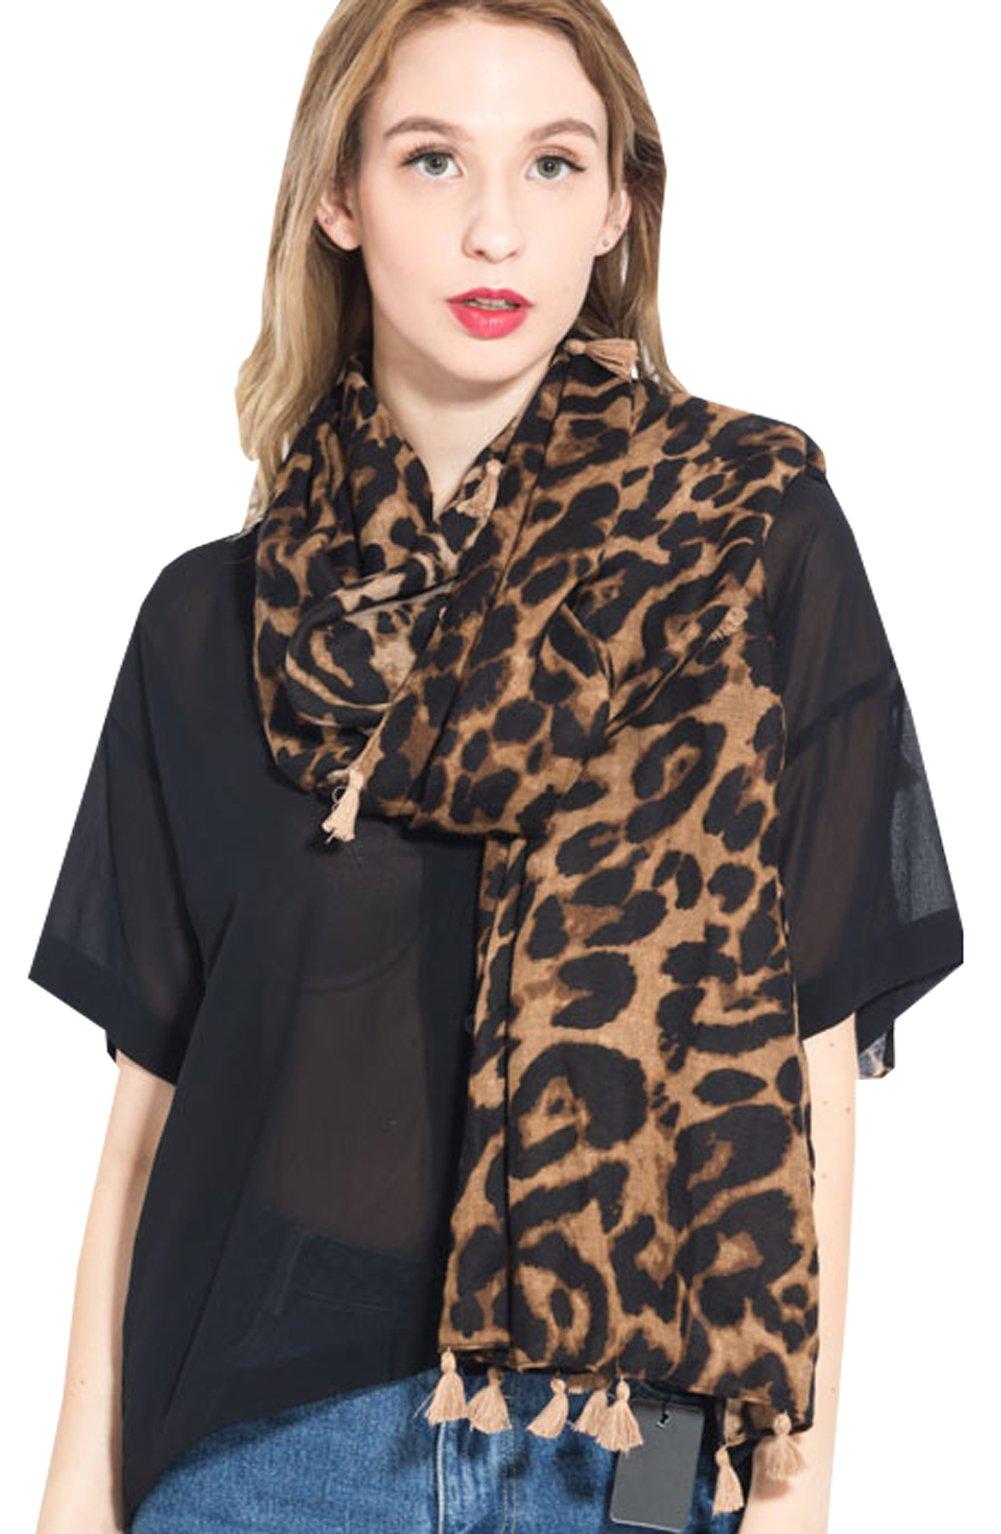 Women Winter Leopard Scarf Warm Long Pashmina Shawls And Wraps Fashion Scarf